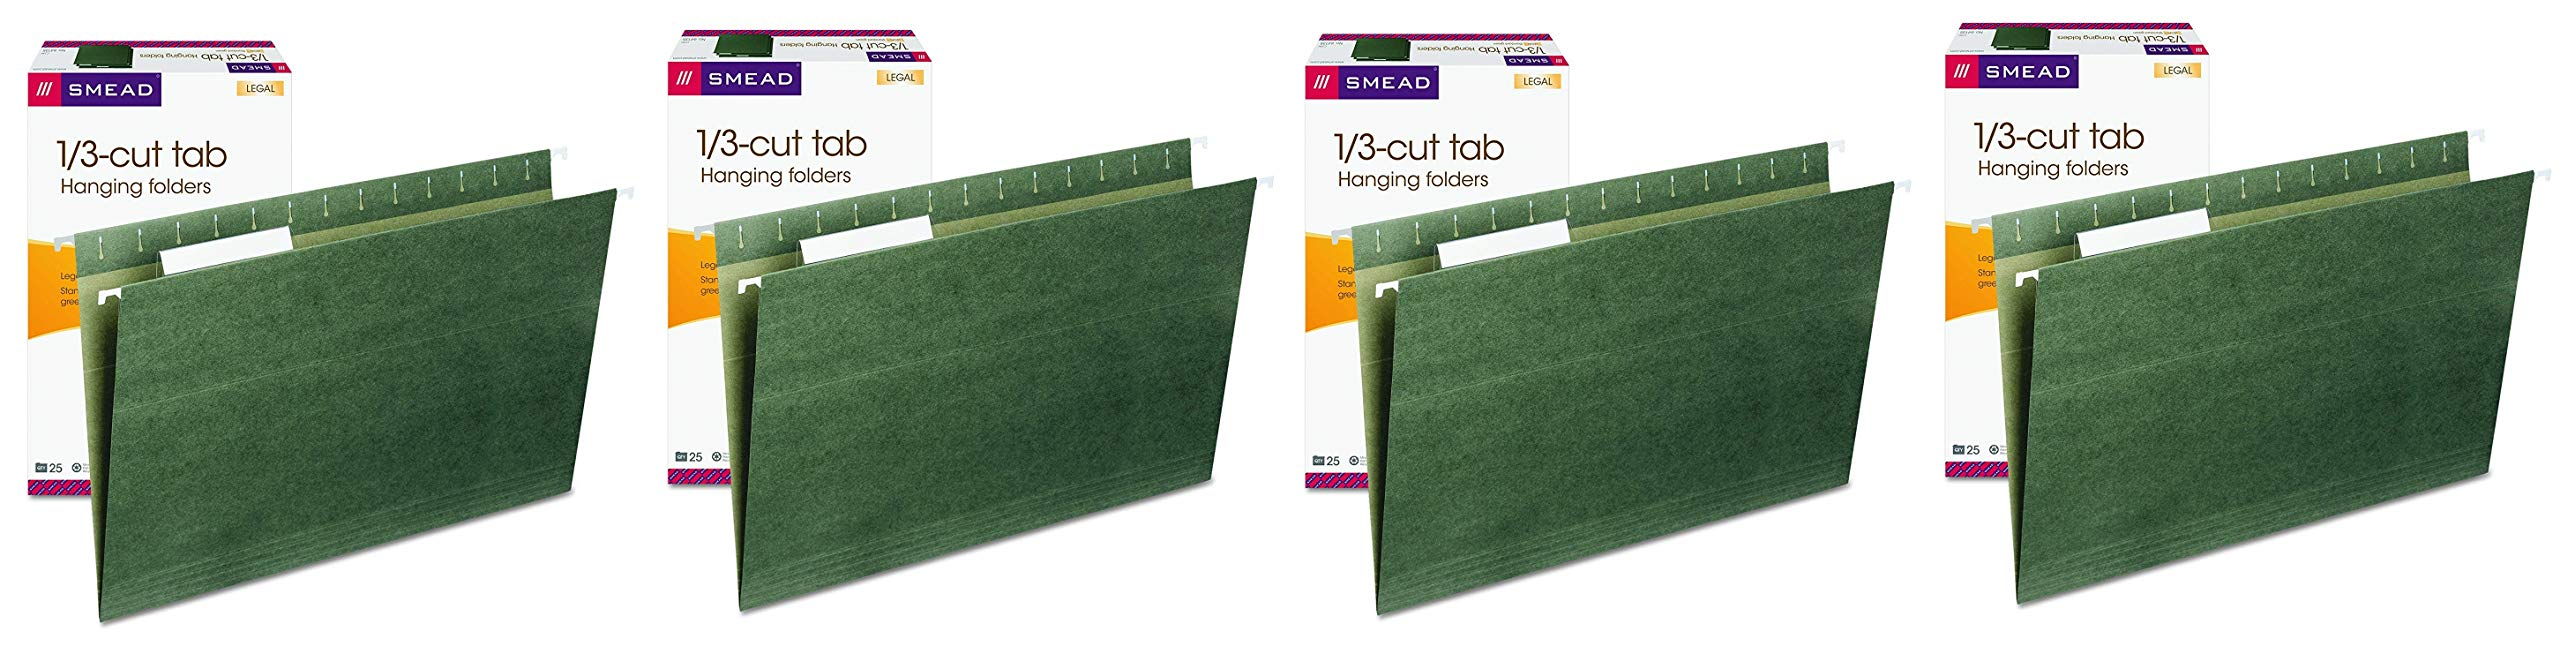 Smead Hanging File Folder with Tab, 1/3-Cut Adjustable Tab, Legal Size, Standard Green, 25 per Box (64135) (Fоur Расk)